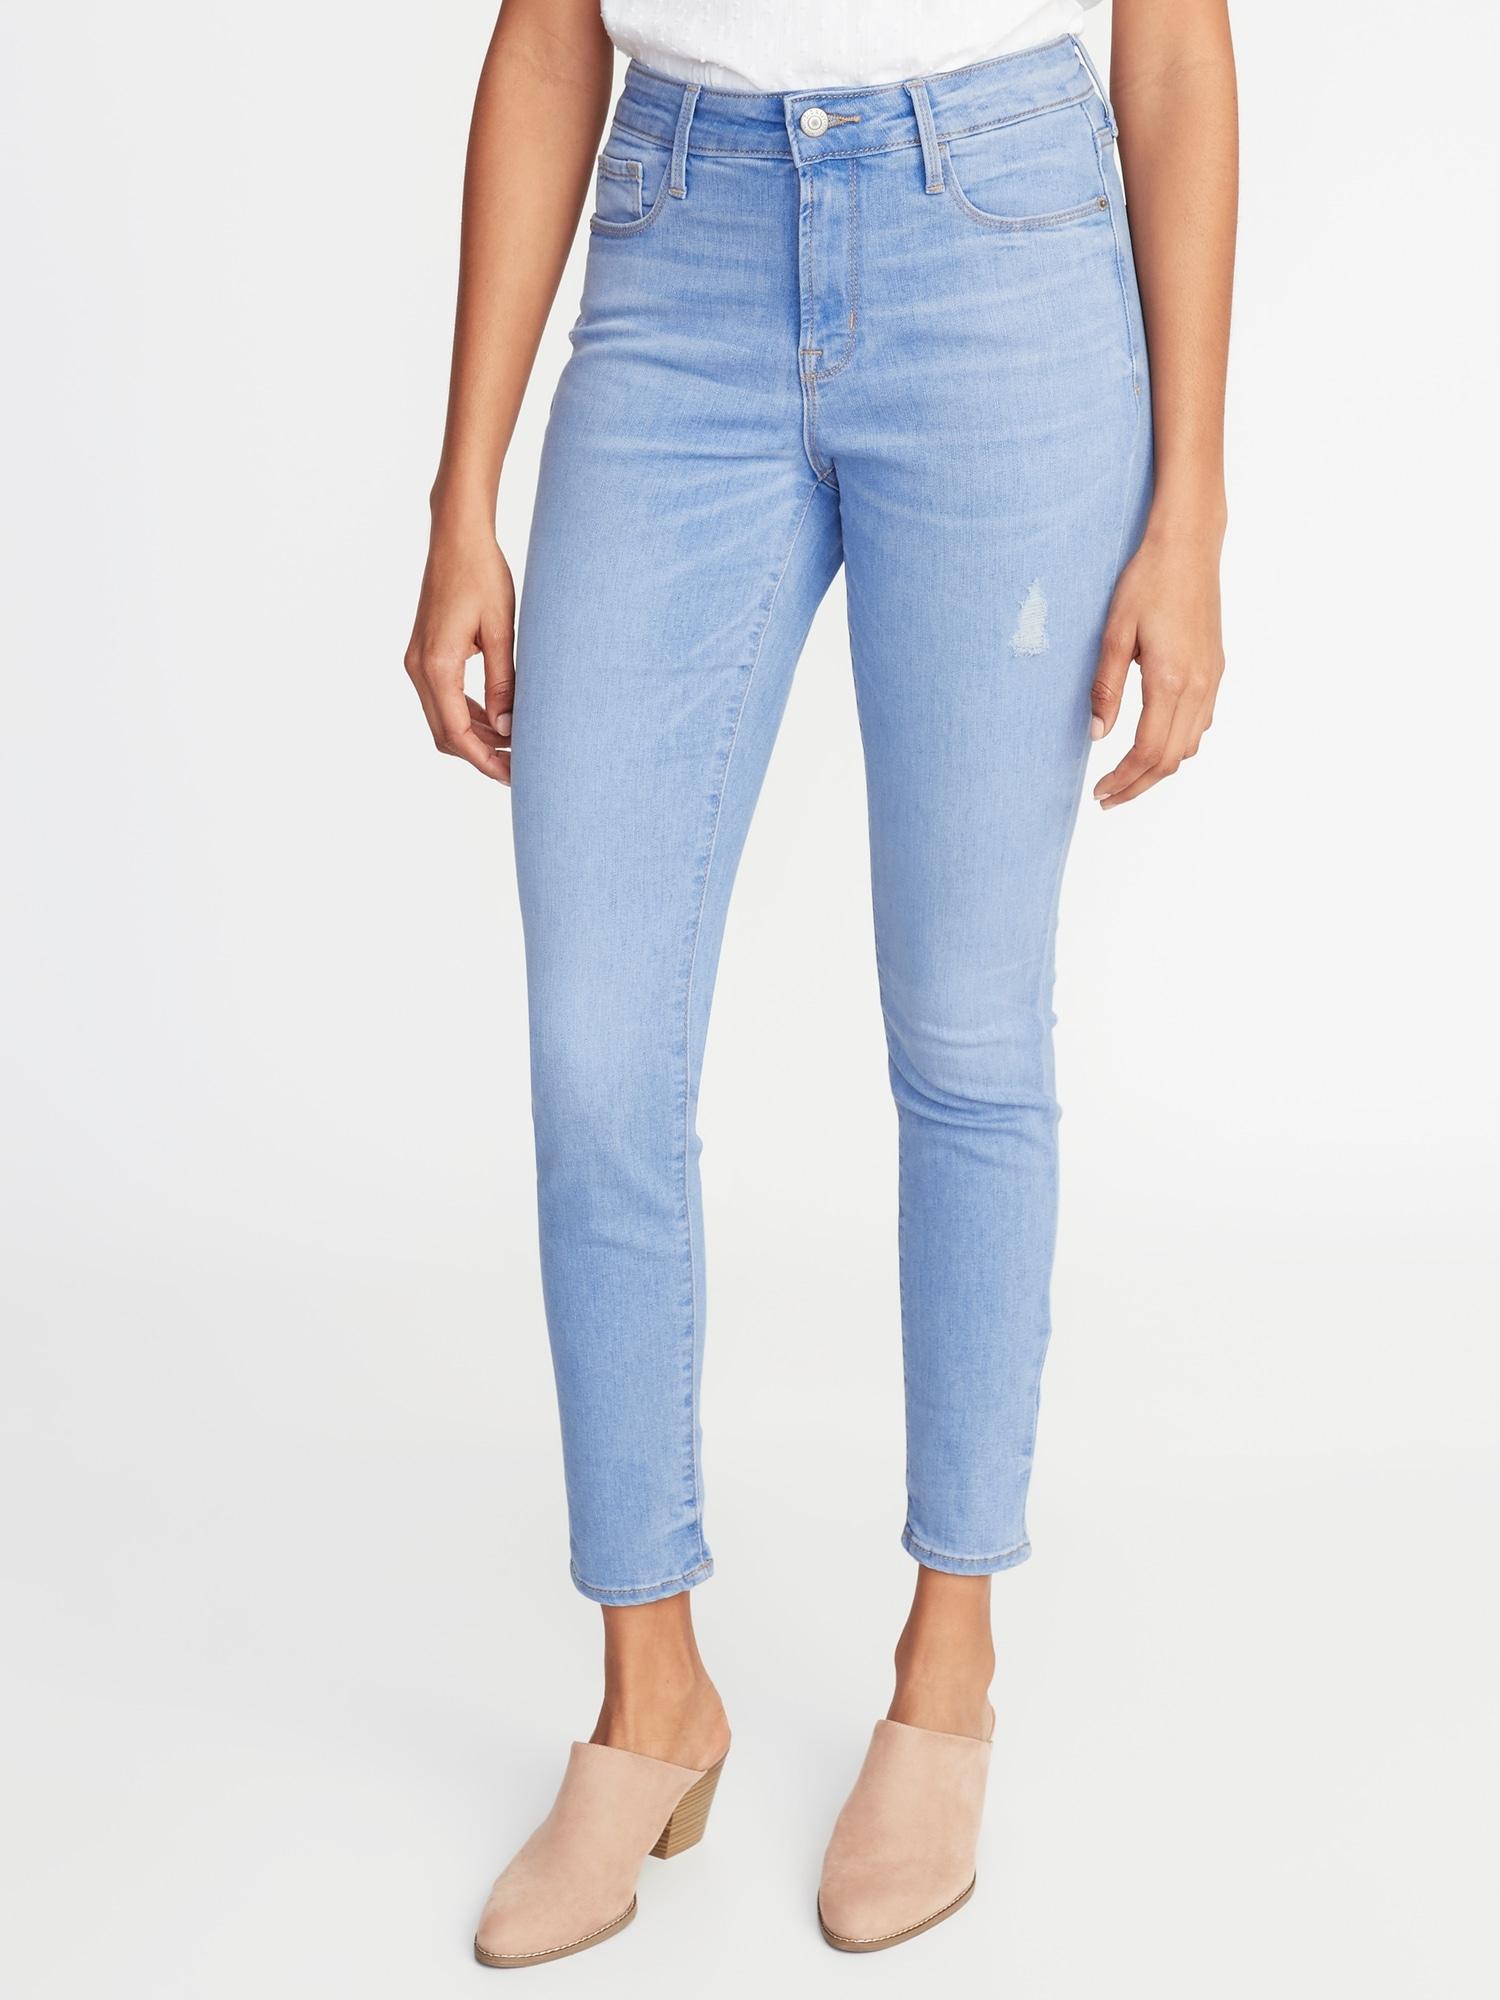 ecb5d6482f1 High-Rise Secret-Slim Pockets Distressed Rockstar Super Skinny Jeans for  Women